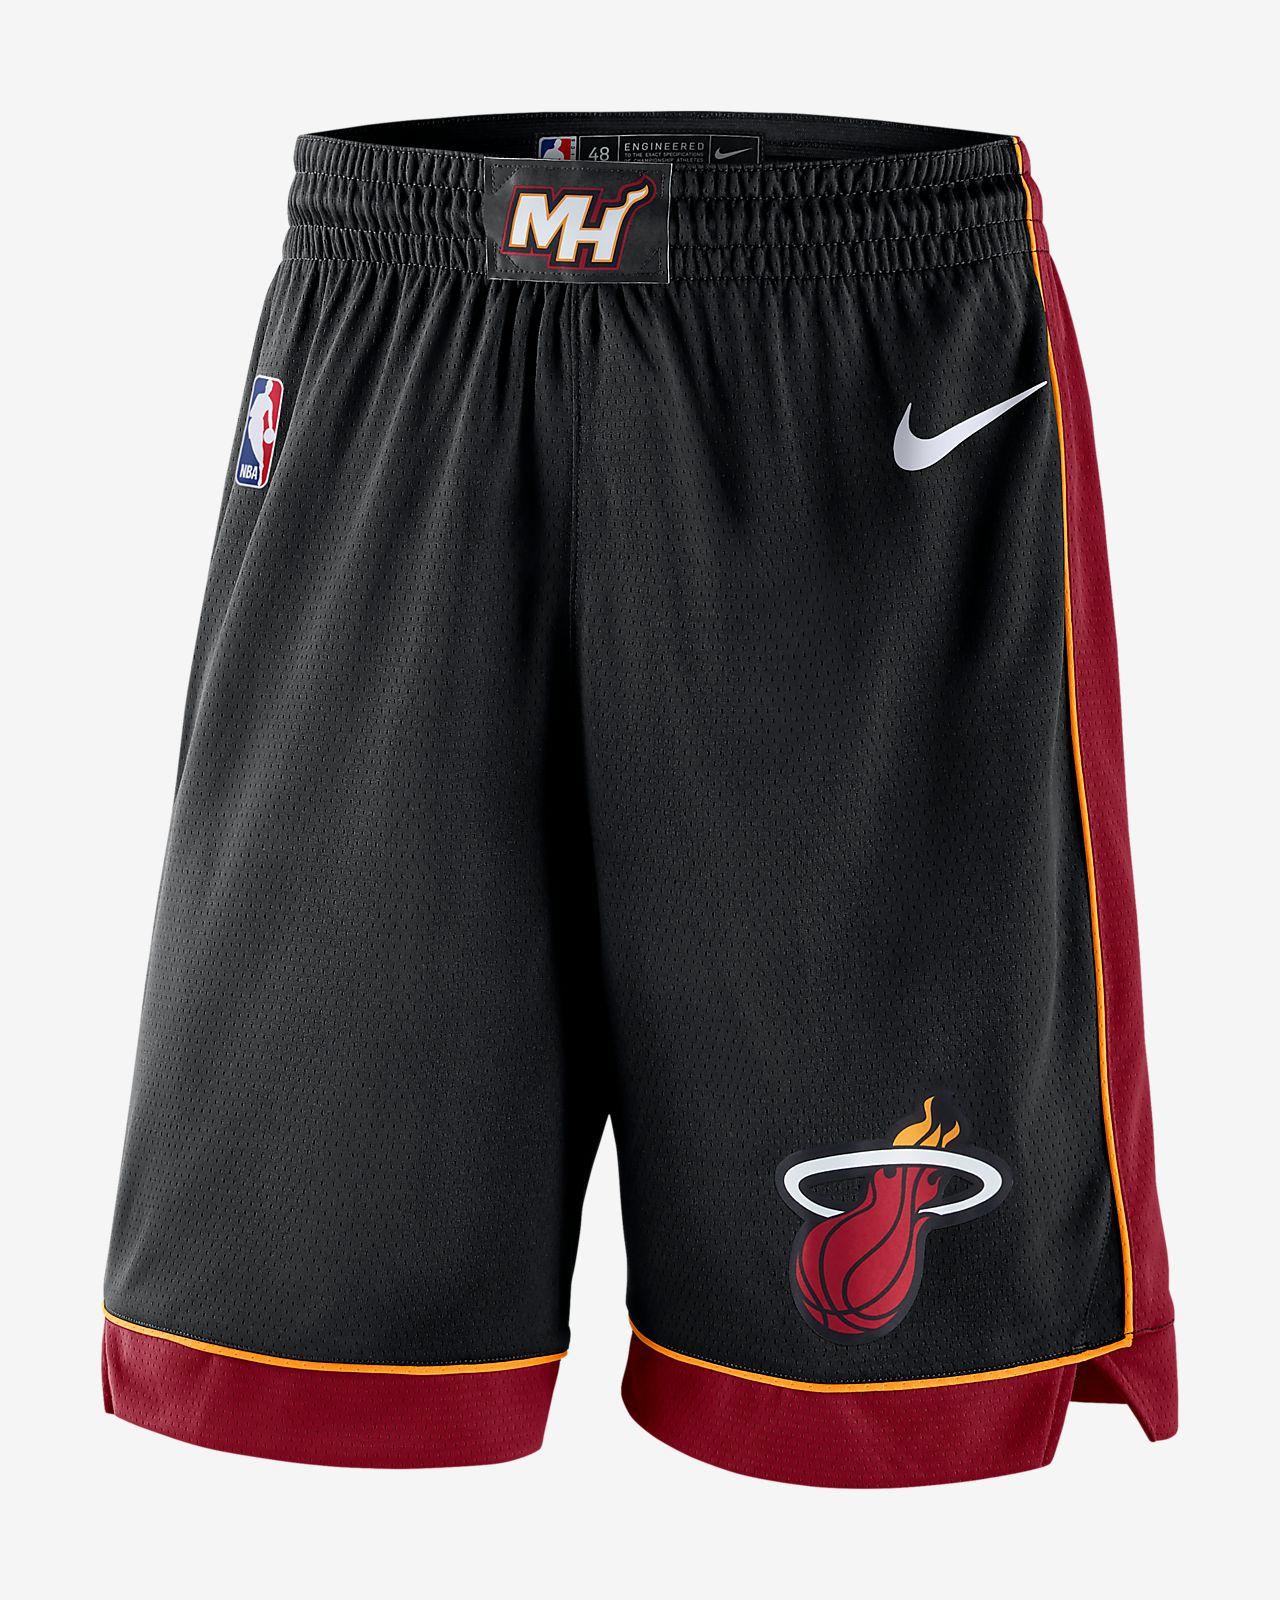 Miami Heat Icon Edition Swingman Men's Nike NBA Shorts